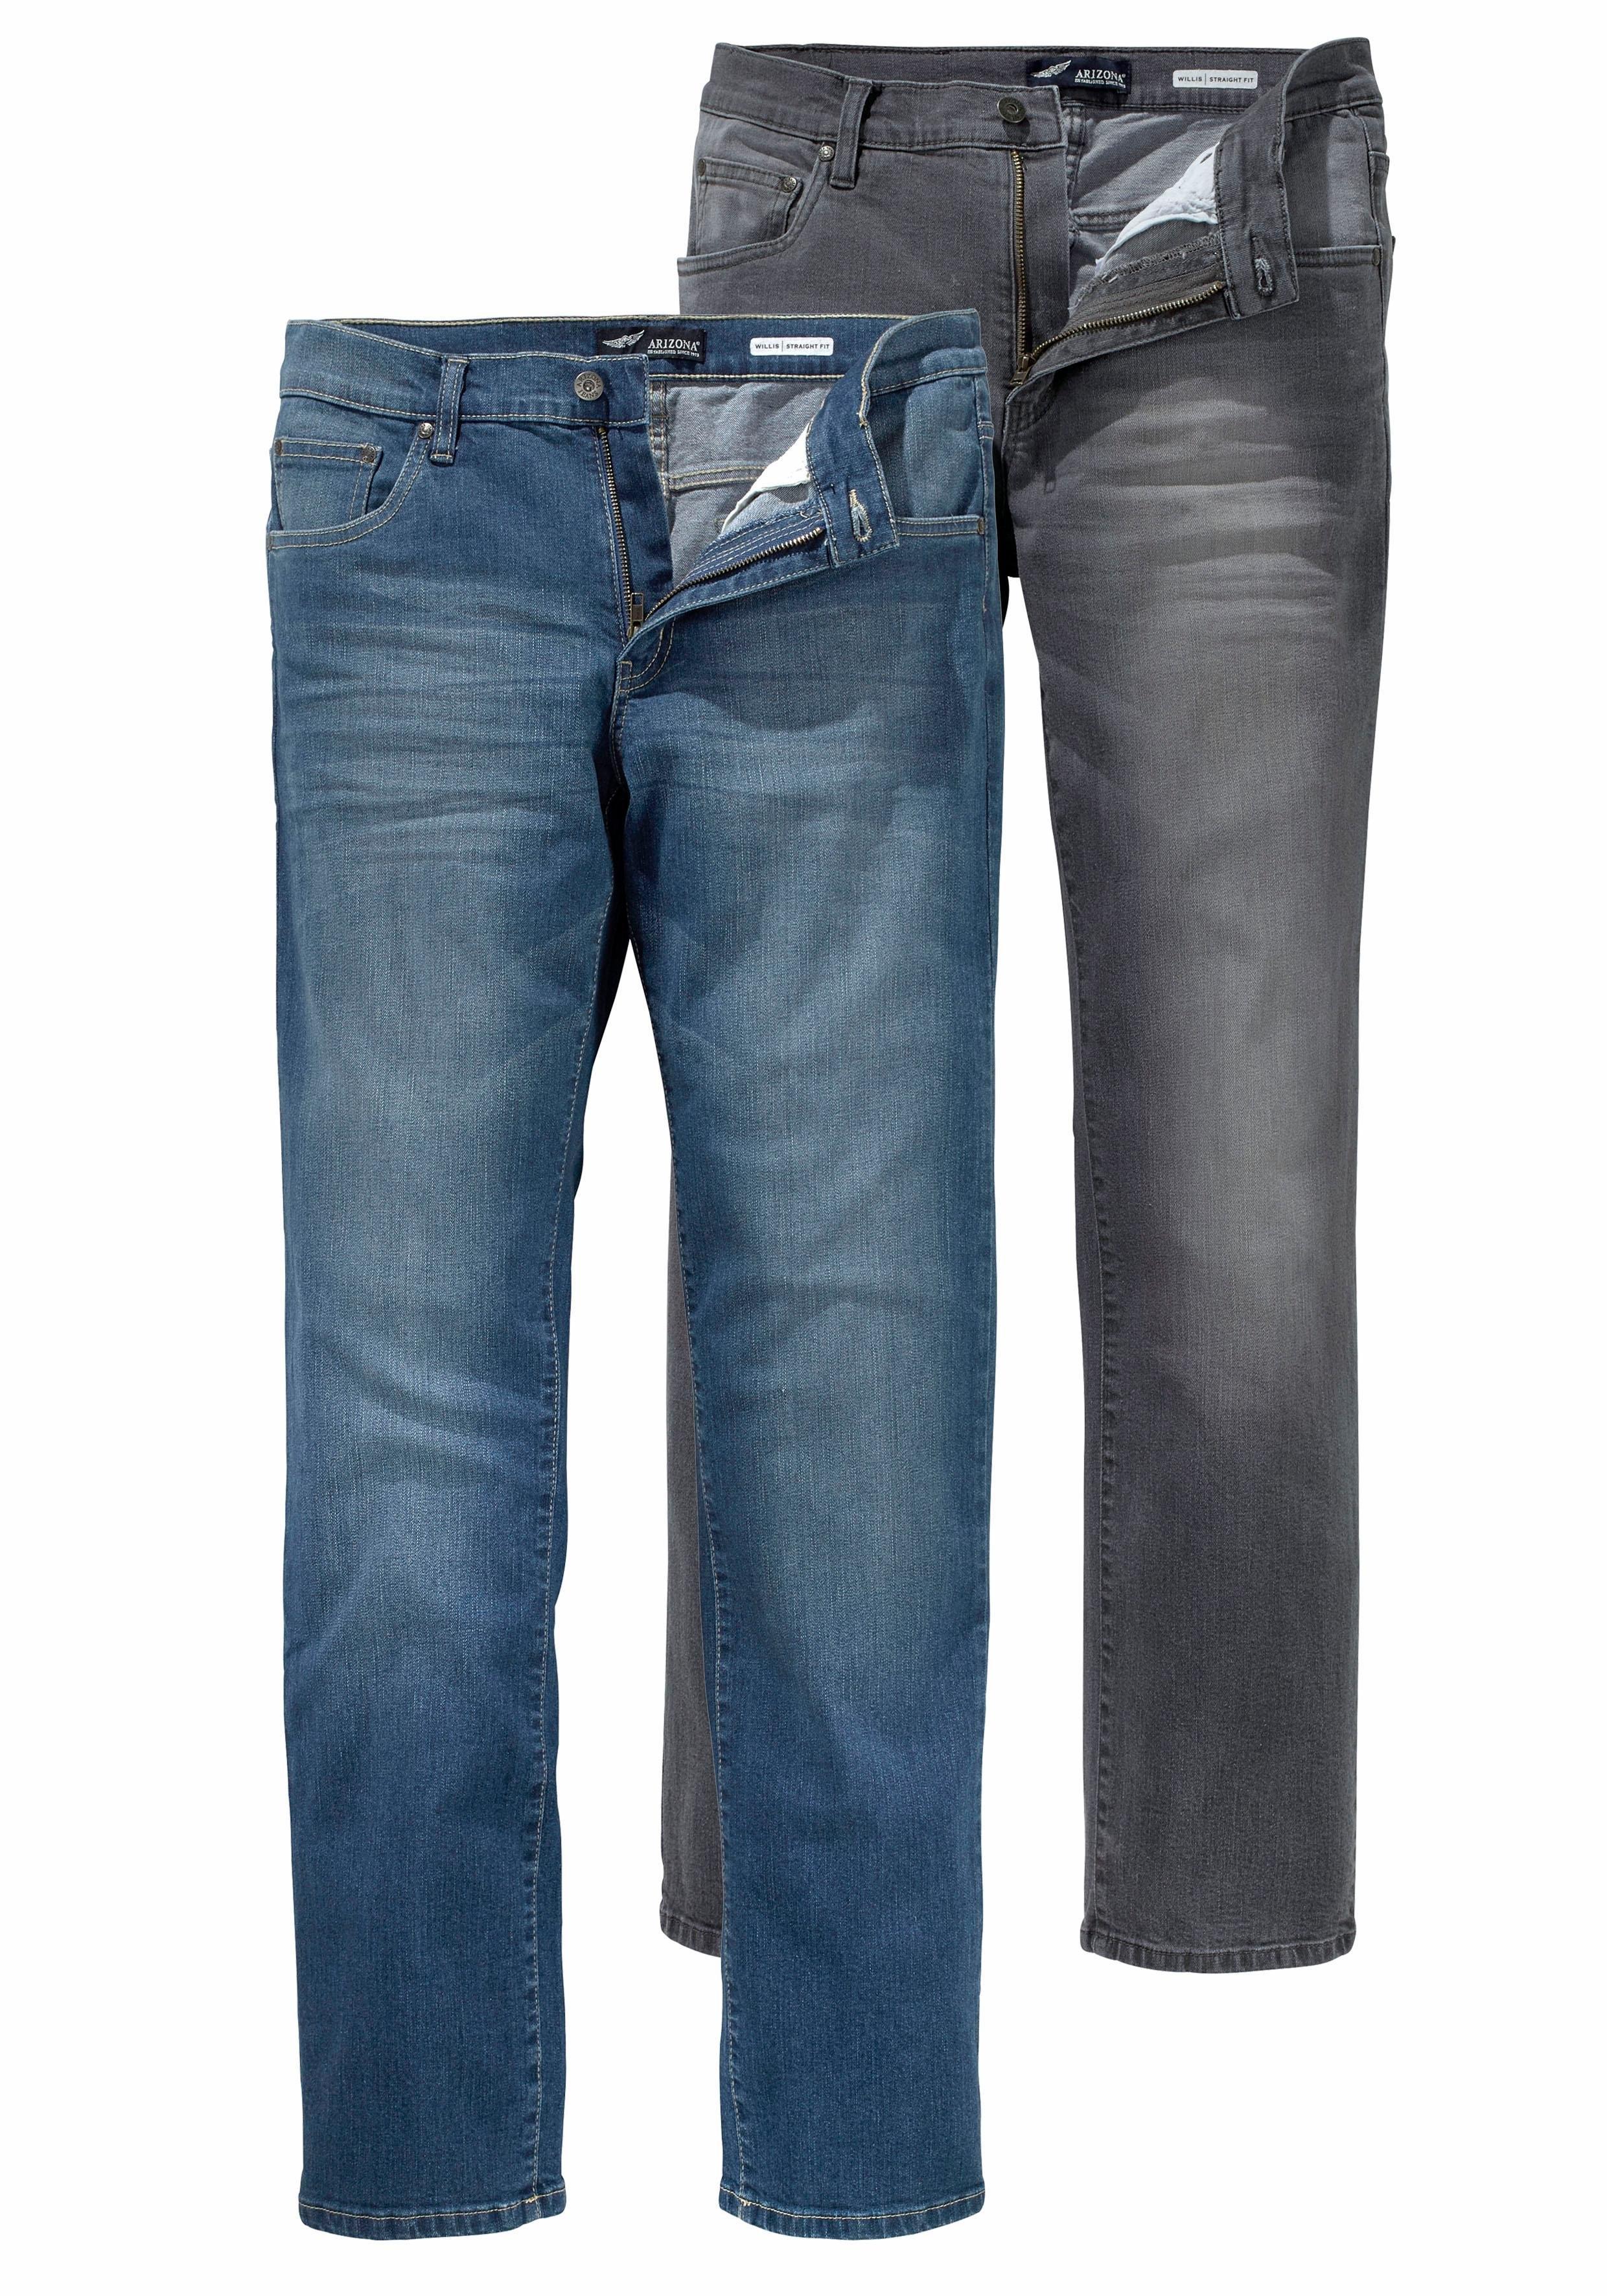 Arizona Stretch jeans Willis Straight fit (set, 2-delig) nu online kopen bij OTTO